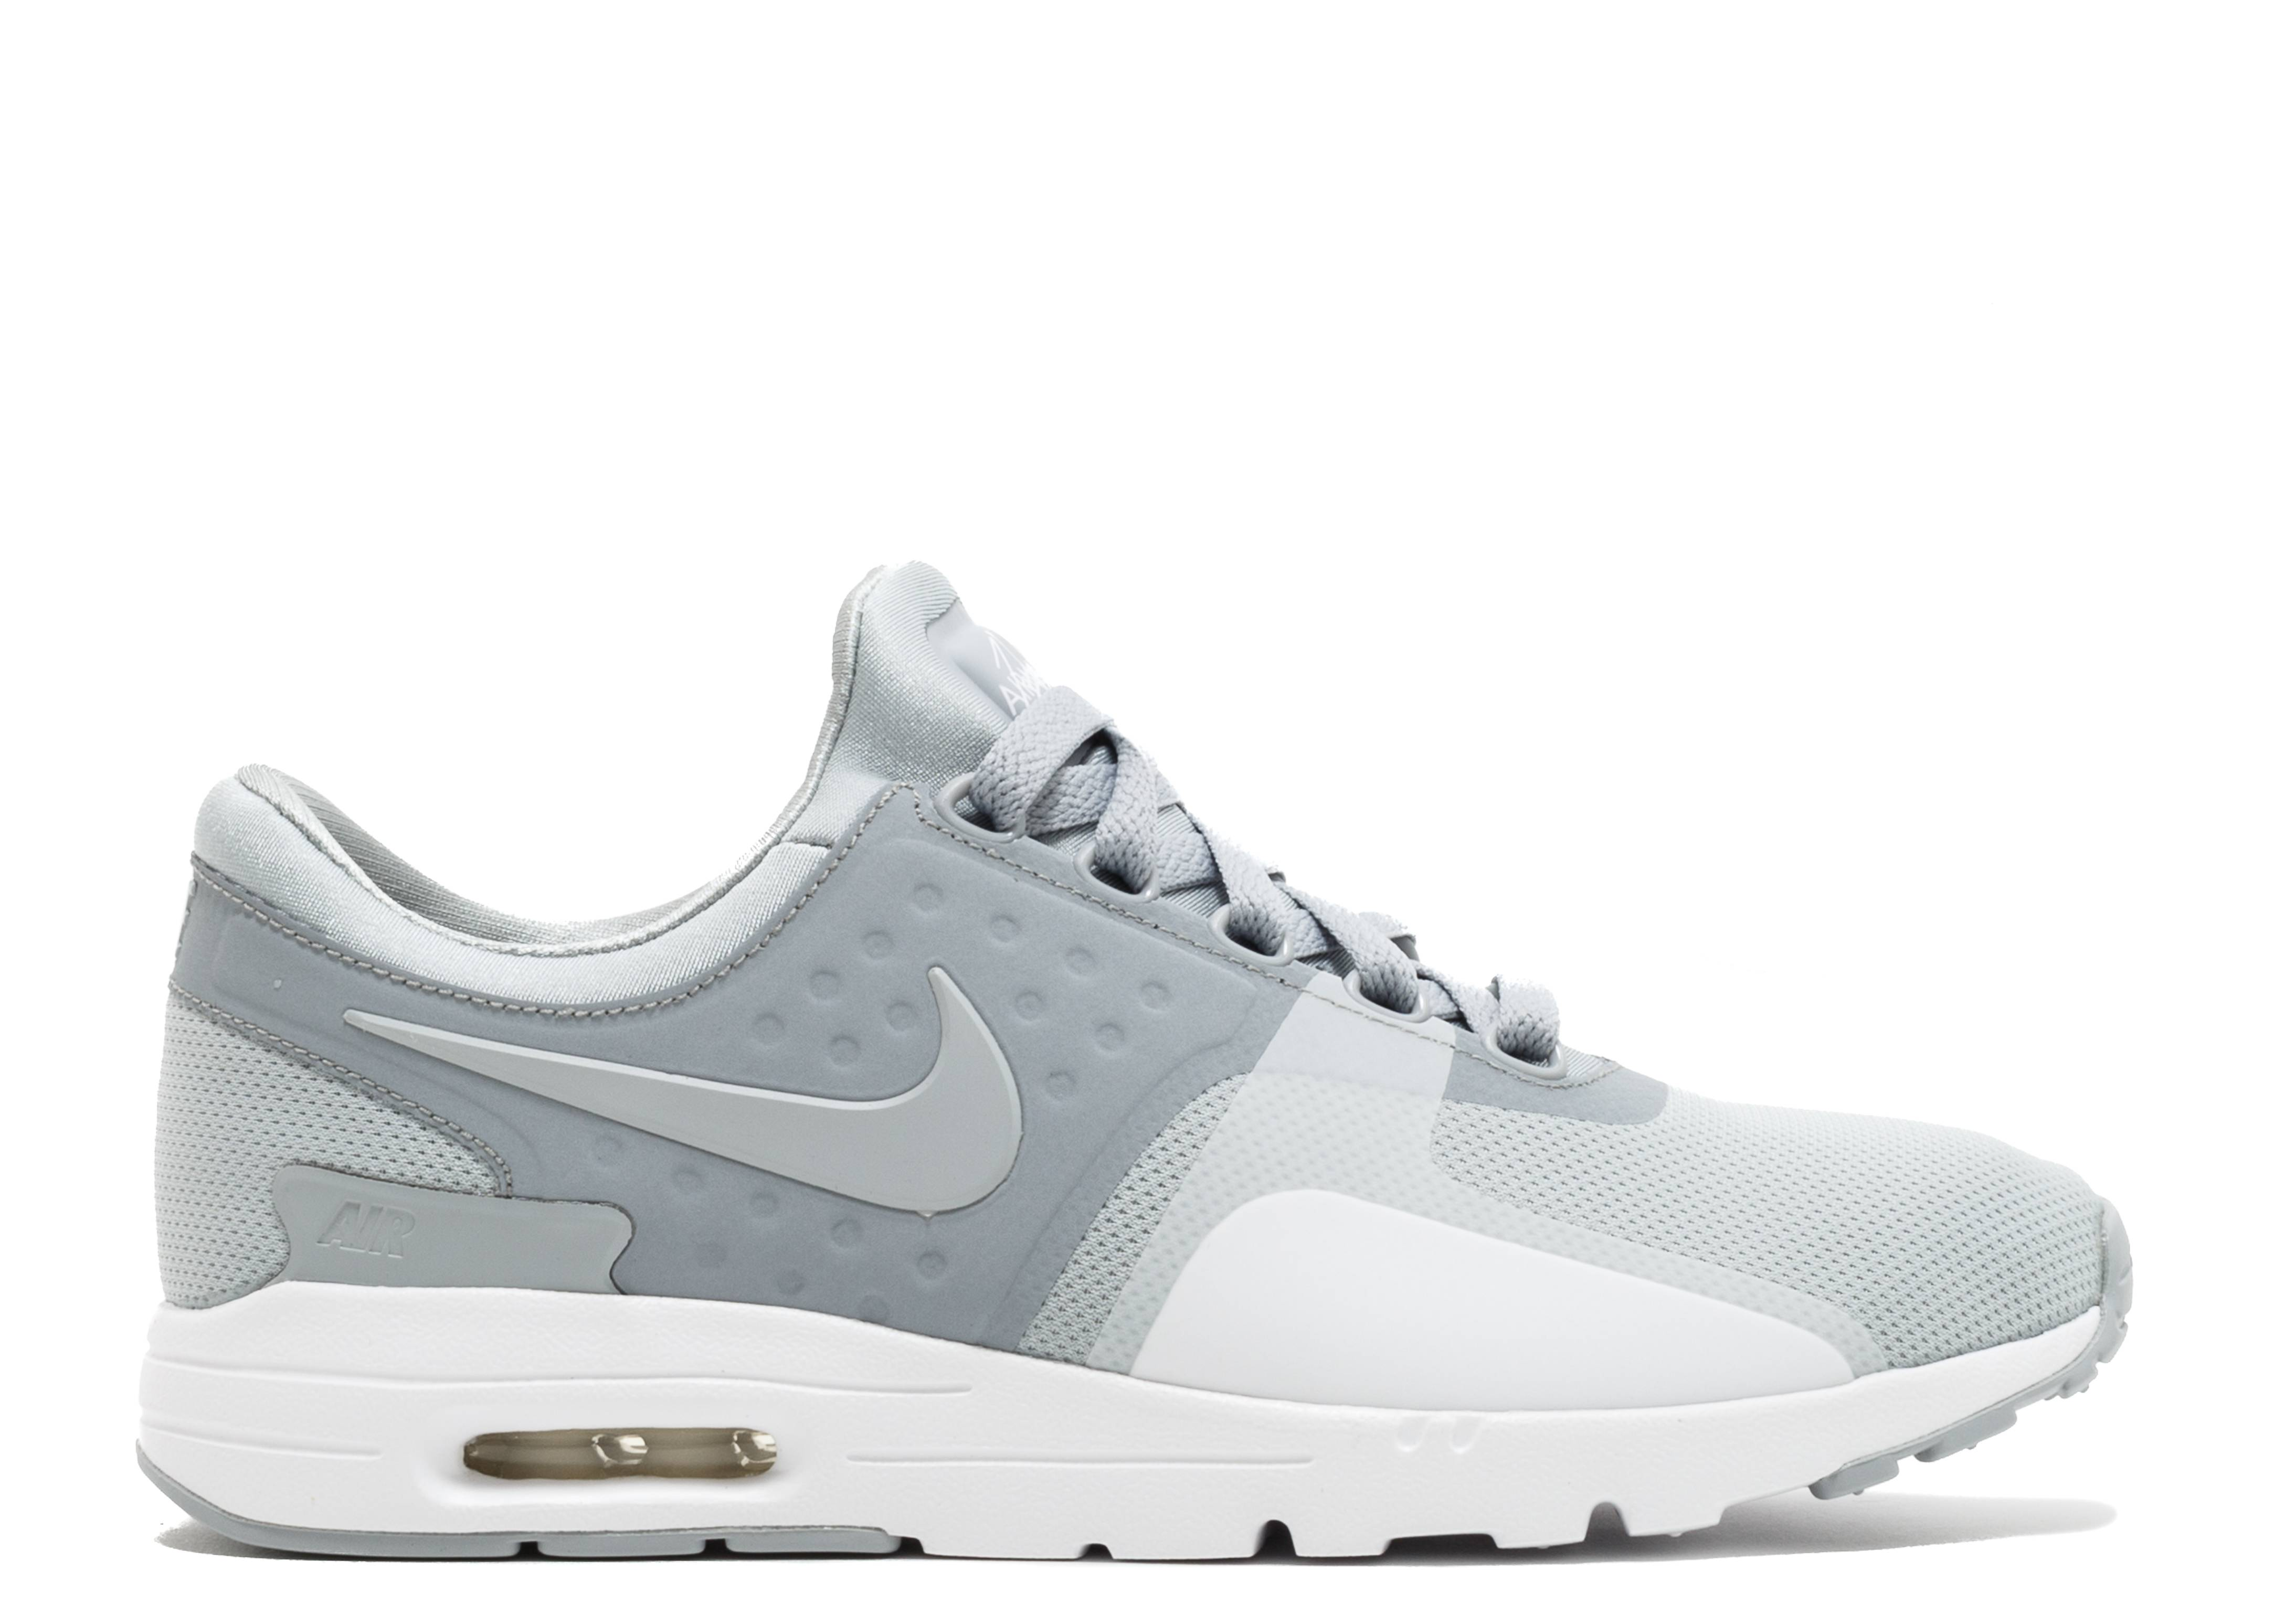 4a04aef6d6f0 Wmns Air Max Zero - Nike - 857661 009 - wolf grey wolf grey-white ...